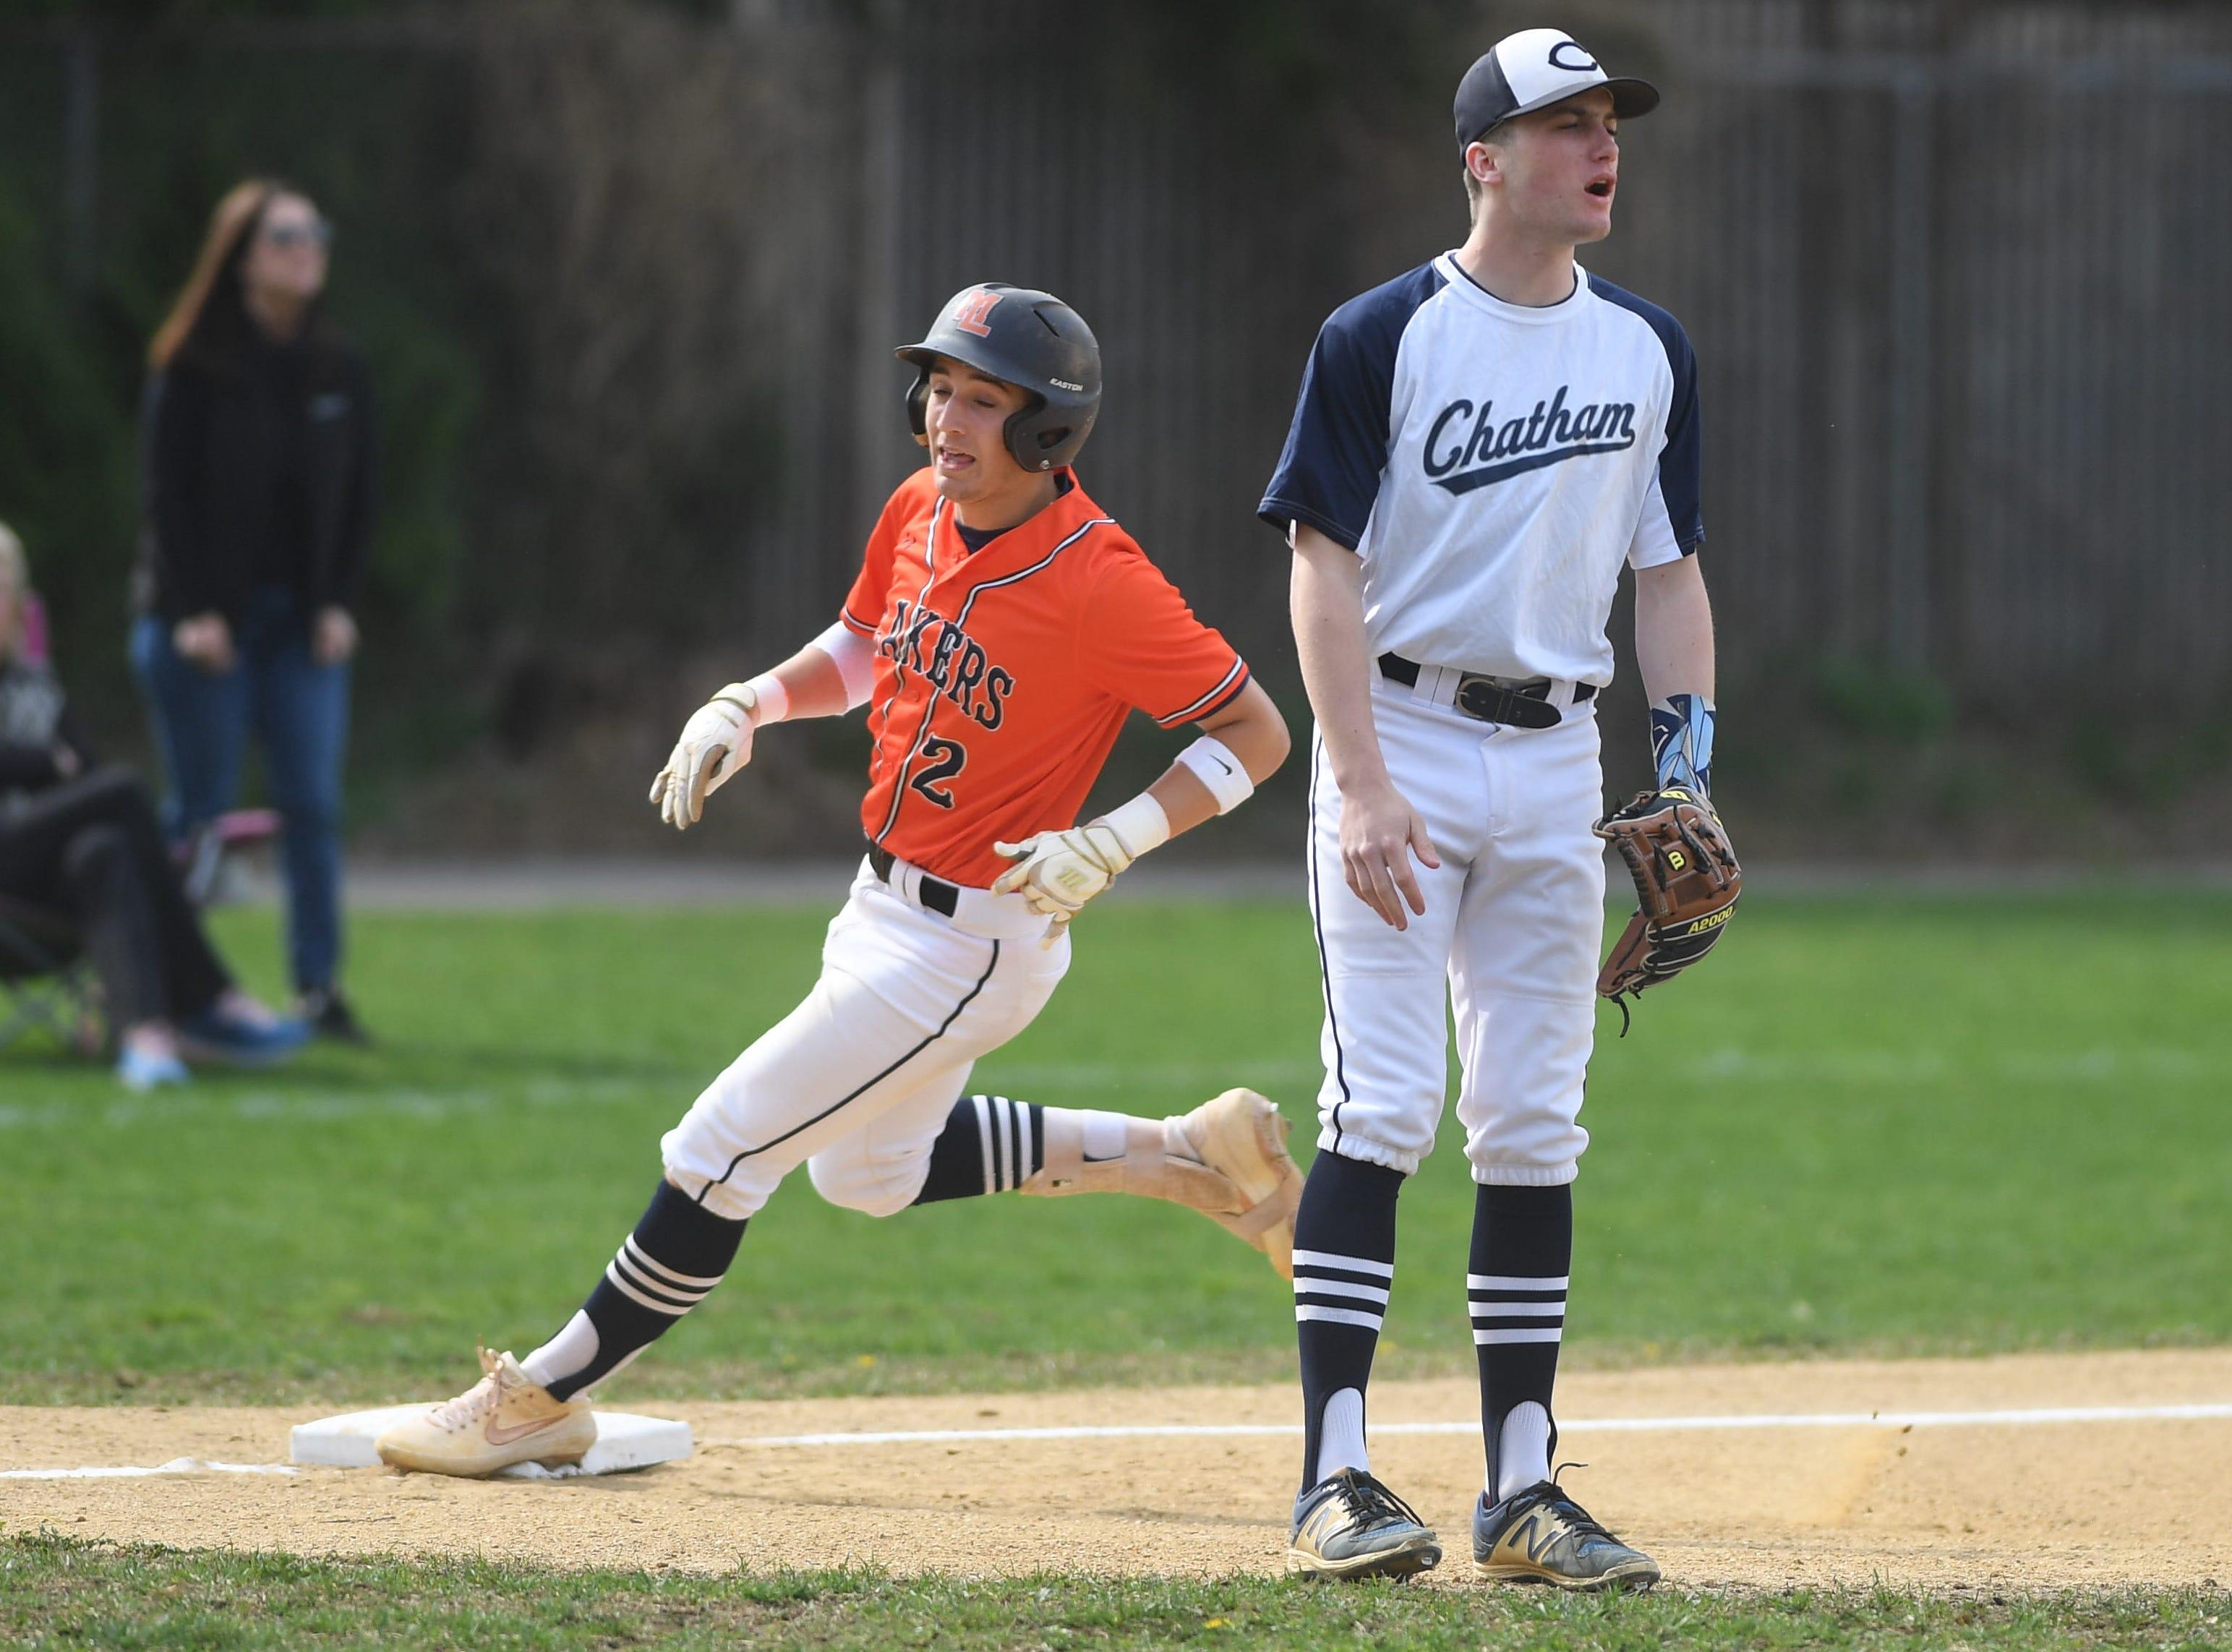 Mountain Lakes baseball at Chatham on Thursday, April 18, 2019. ML #2 Jason Luzzi is safe at third. (right) CM #17 Ben Krill.